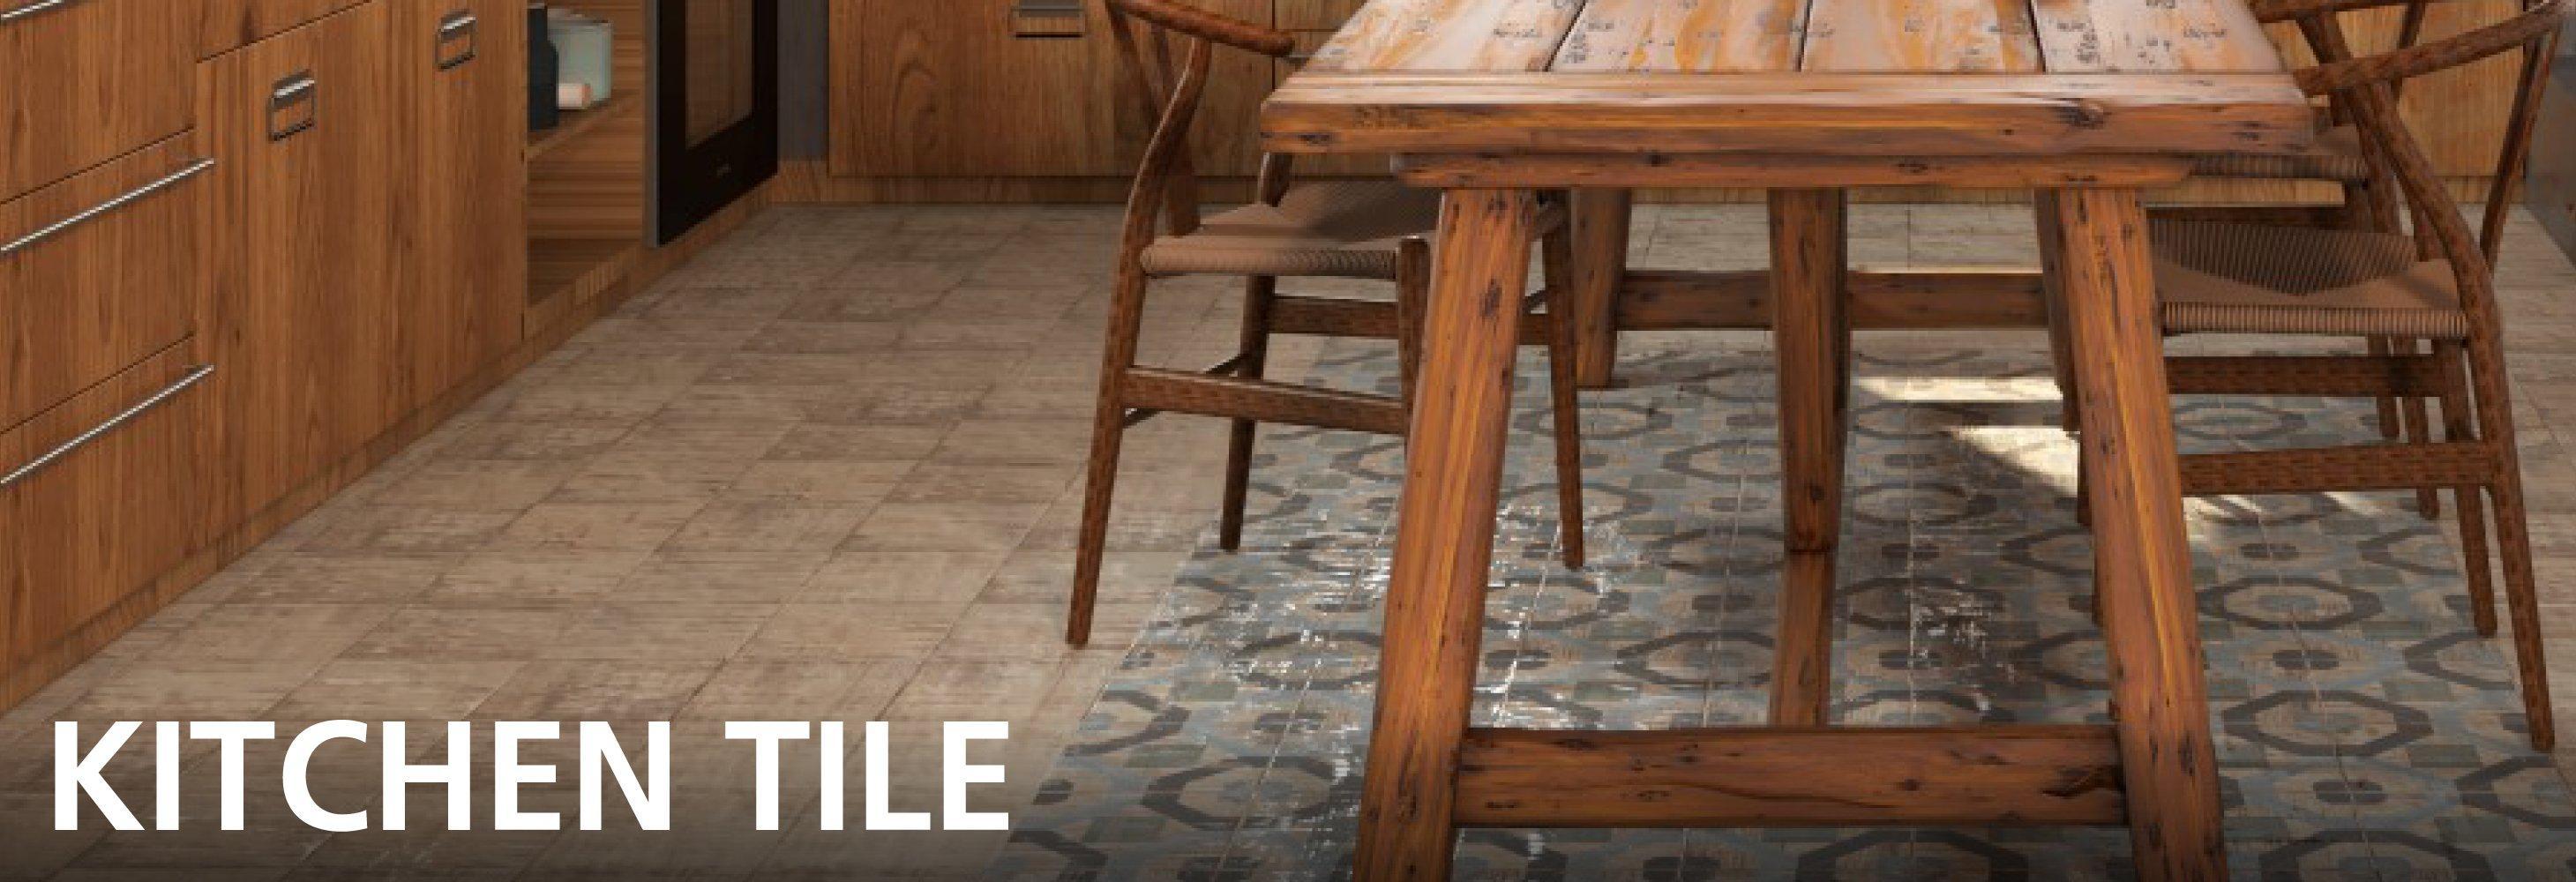 Kitchen Tile Floor Decor